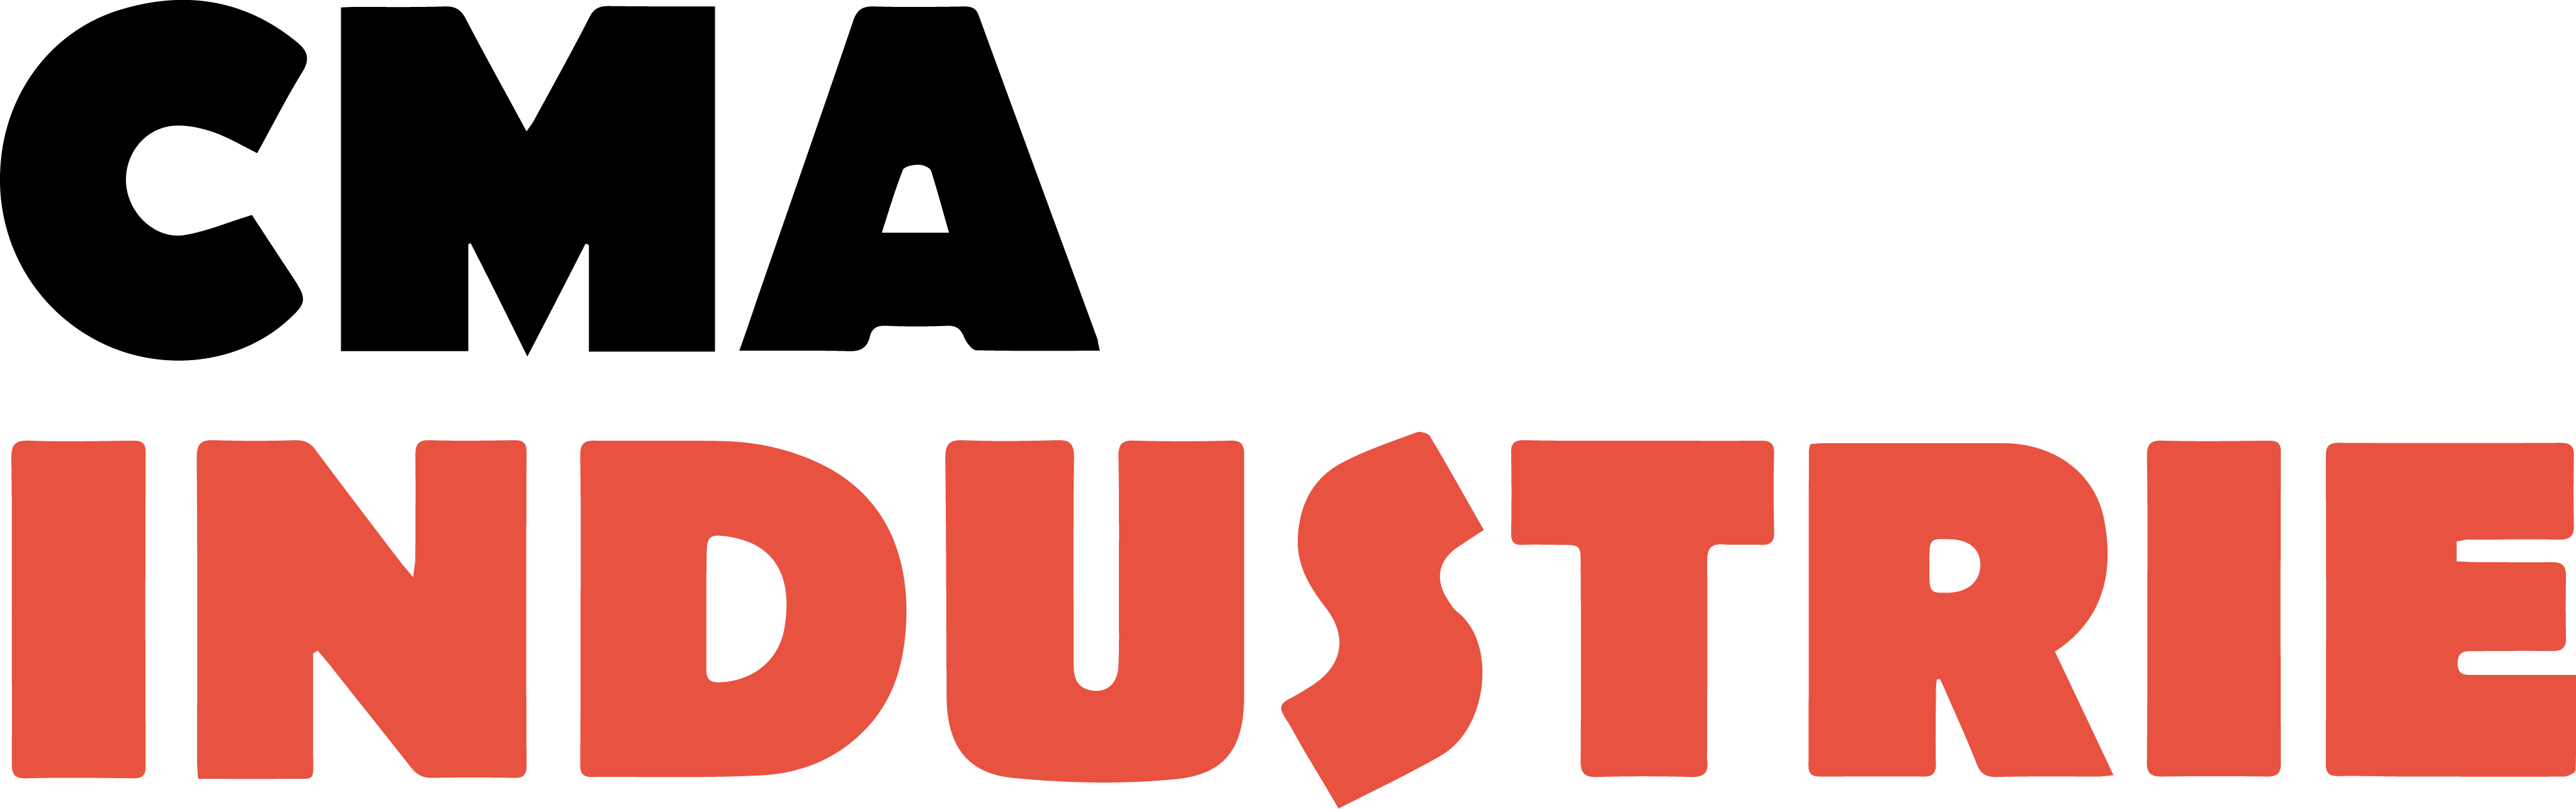 CMA Industrie